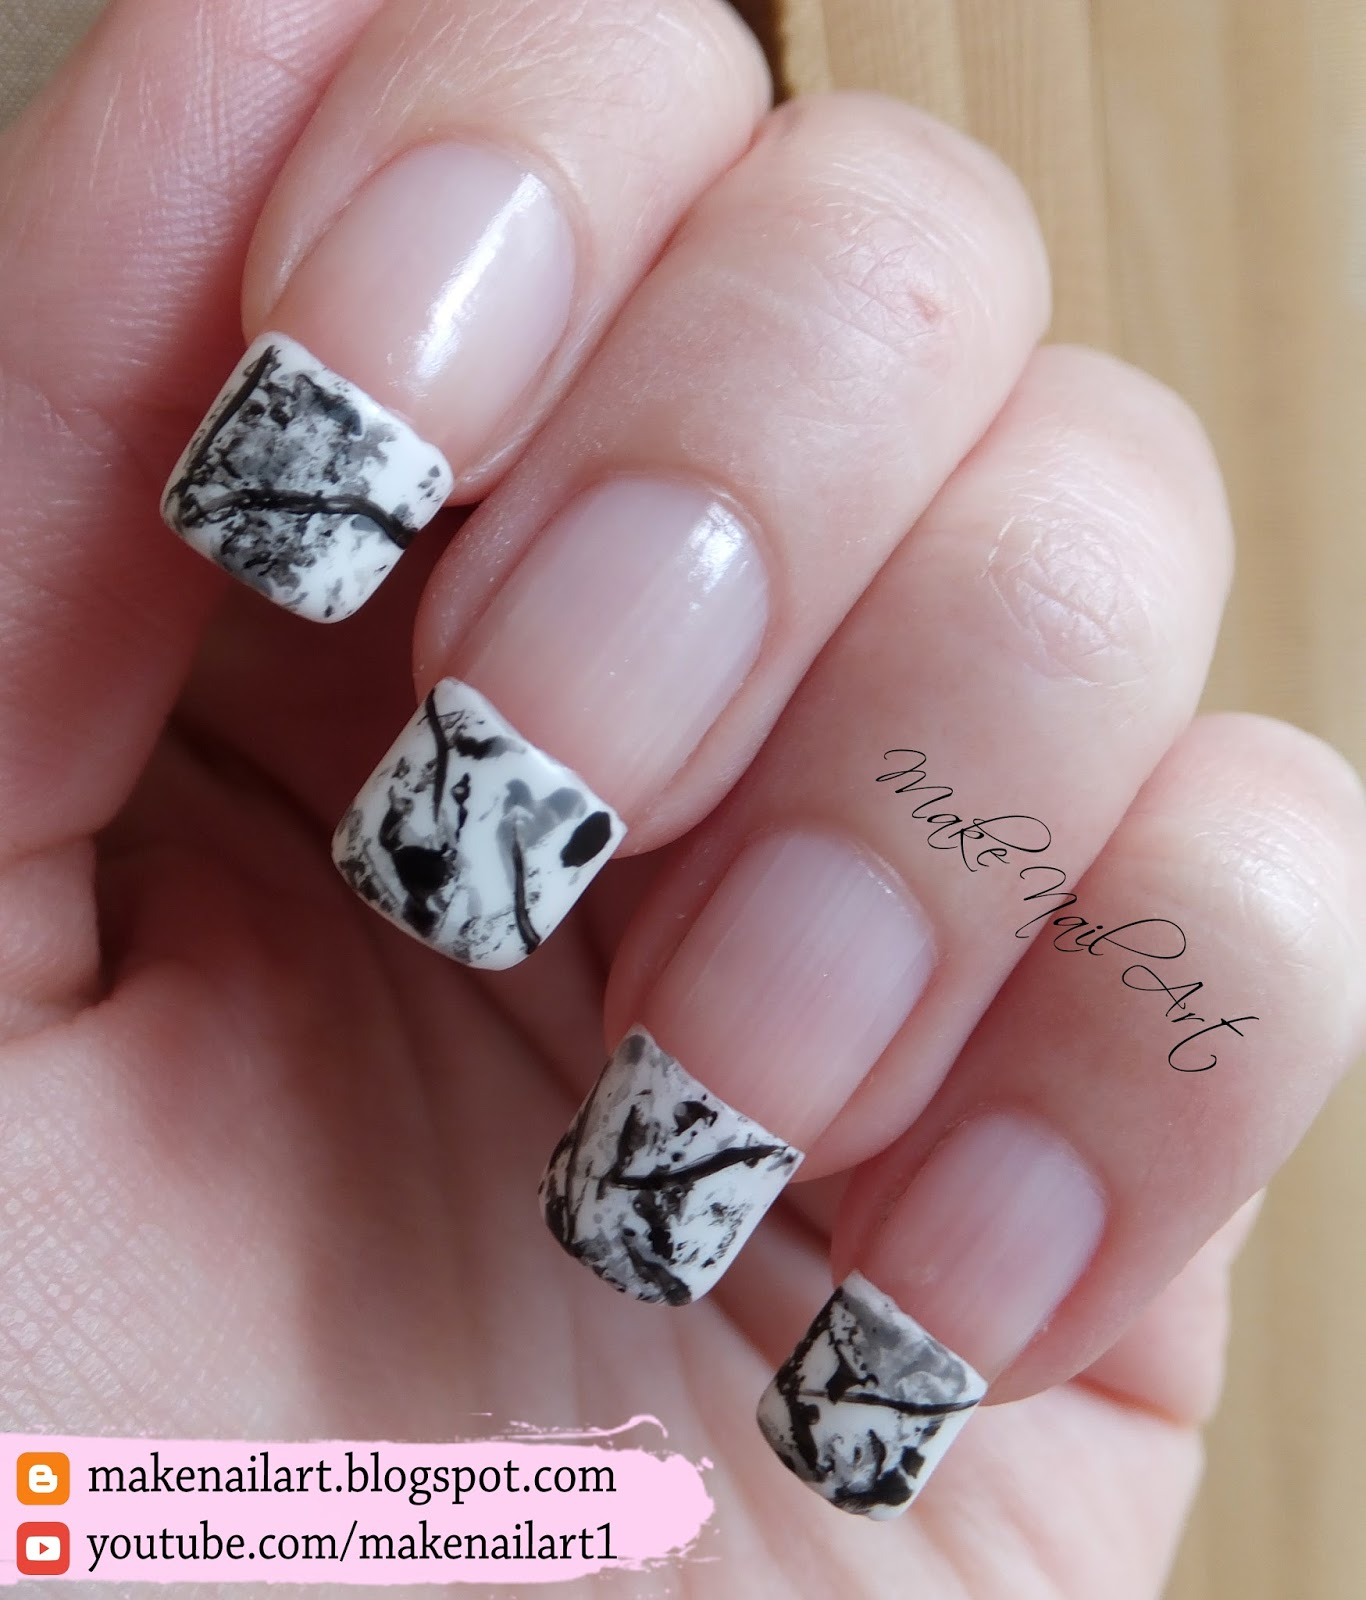 Make Nail Art Stone Marble French Manicure Nail Art Design Tutorial